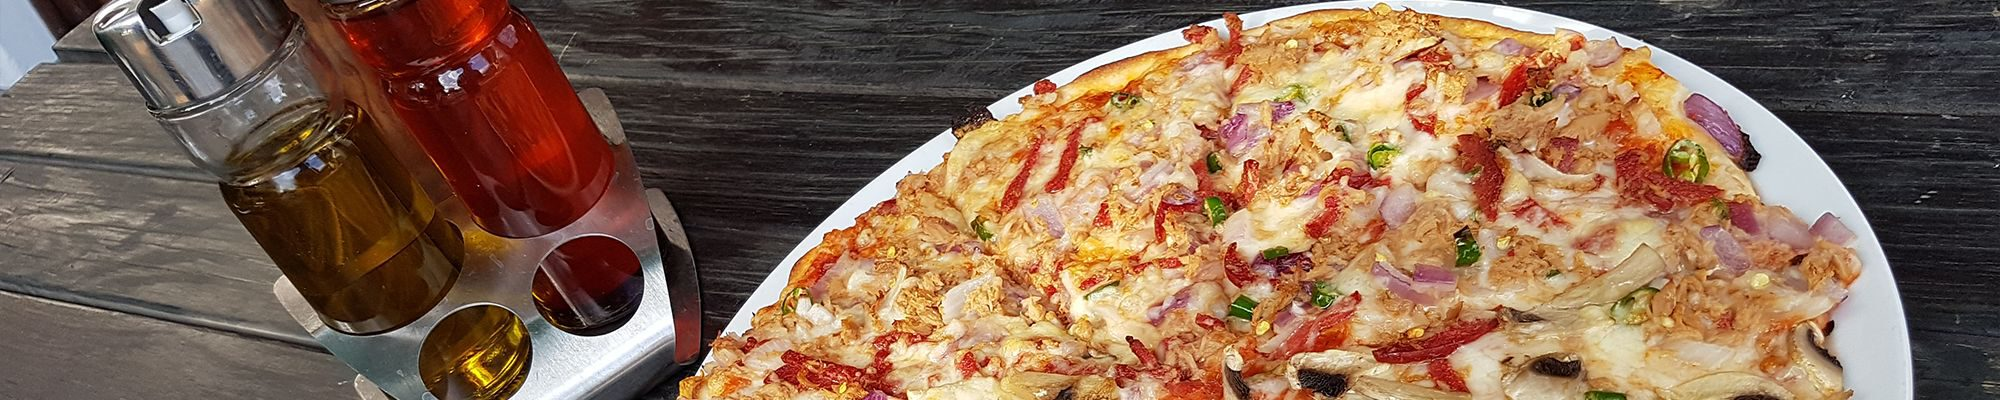 Pizzeria Verdura